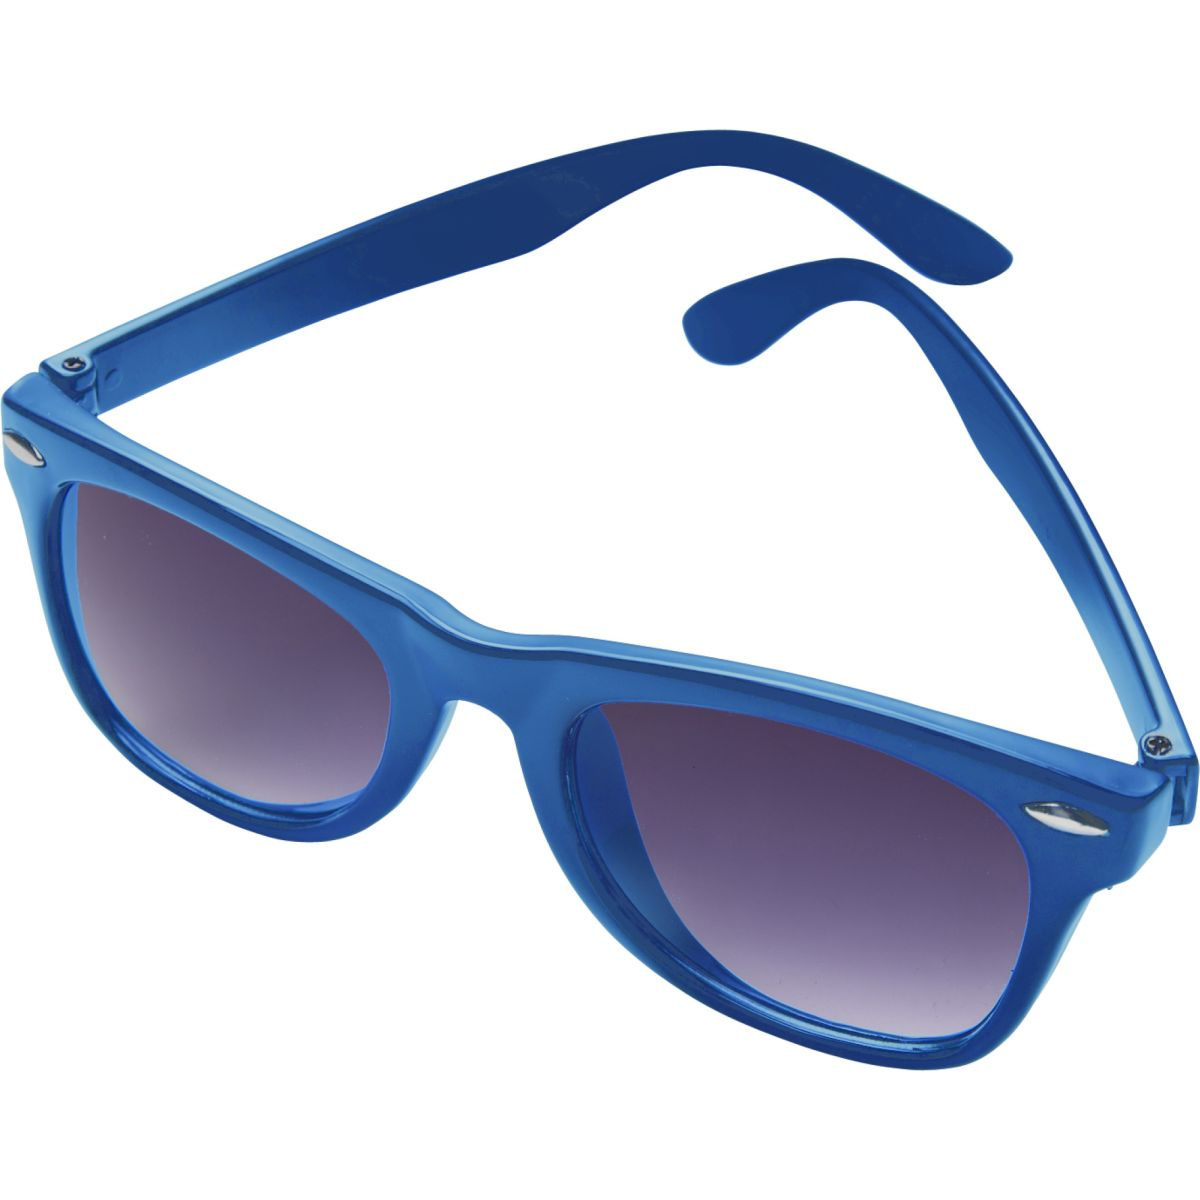 928fb0fe88 Childrens Plastic Sunglasses